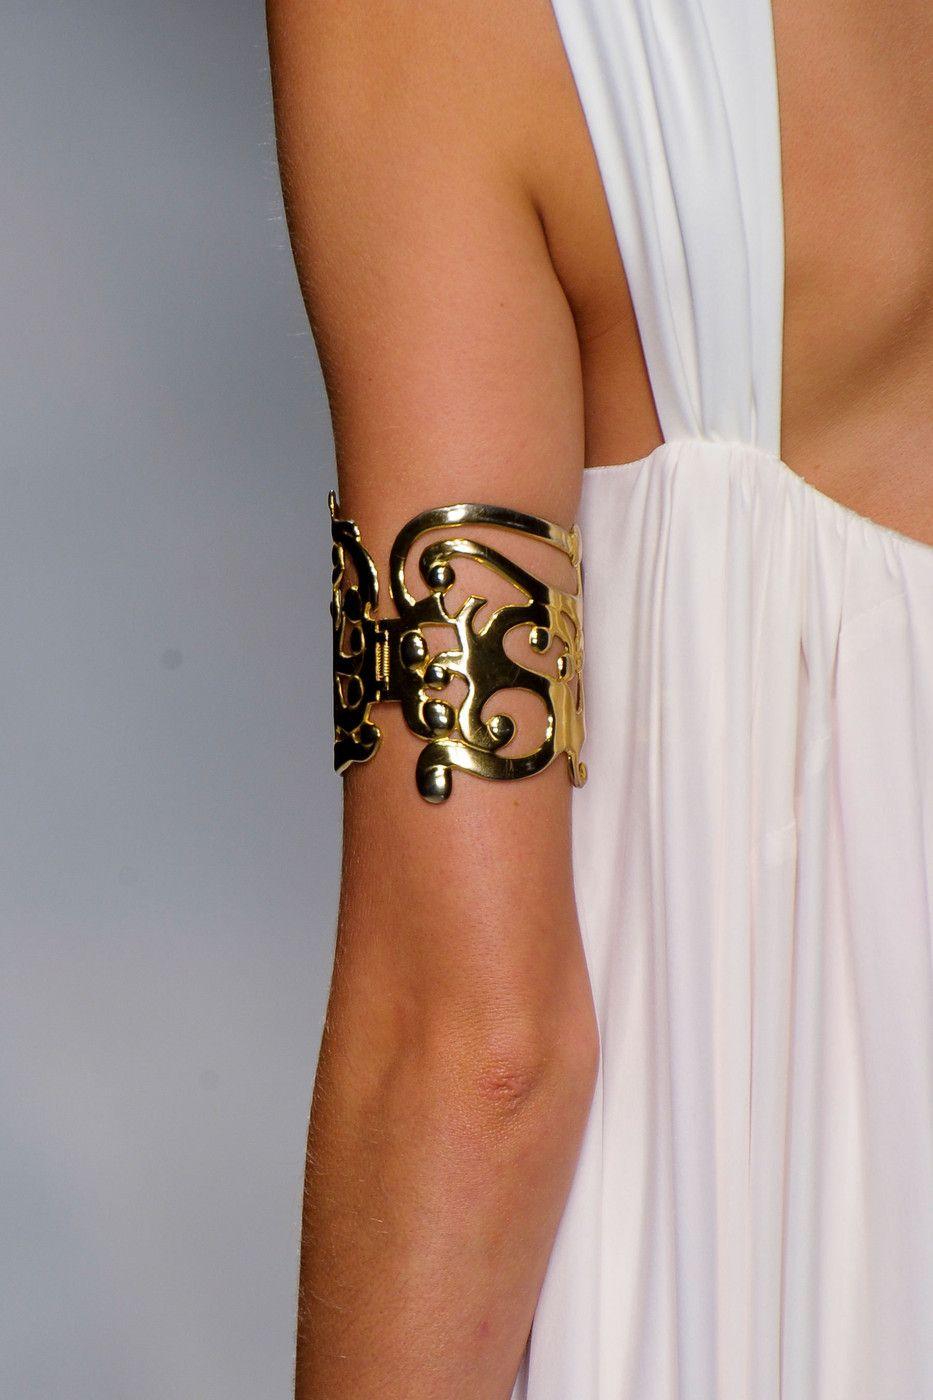 Issa Spring 2013. armband.